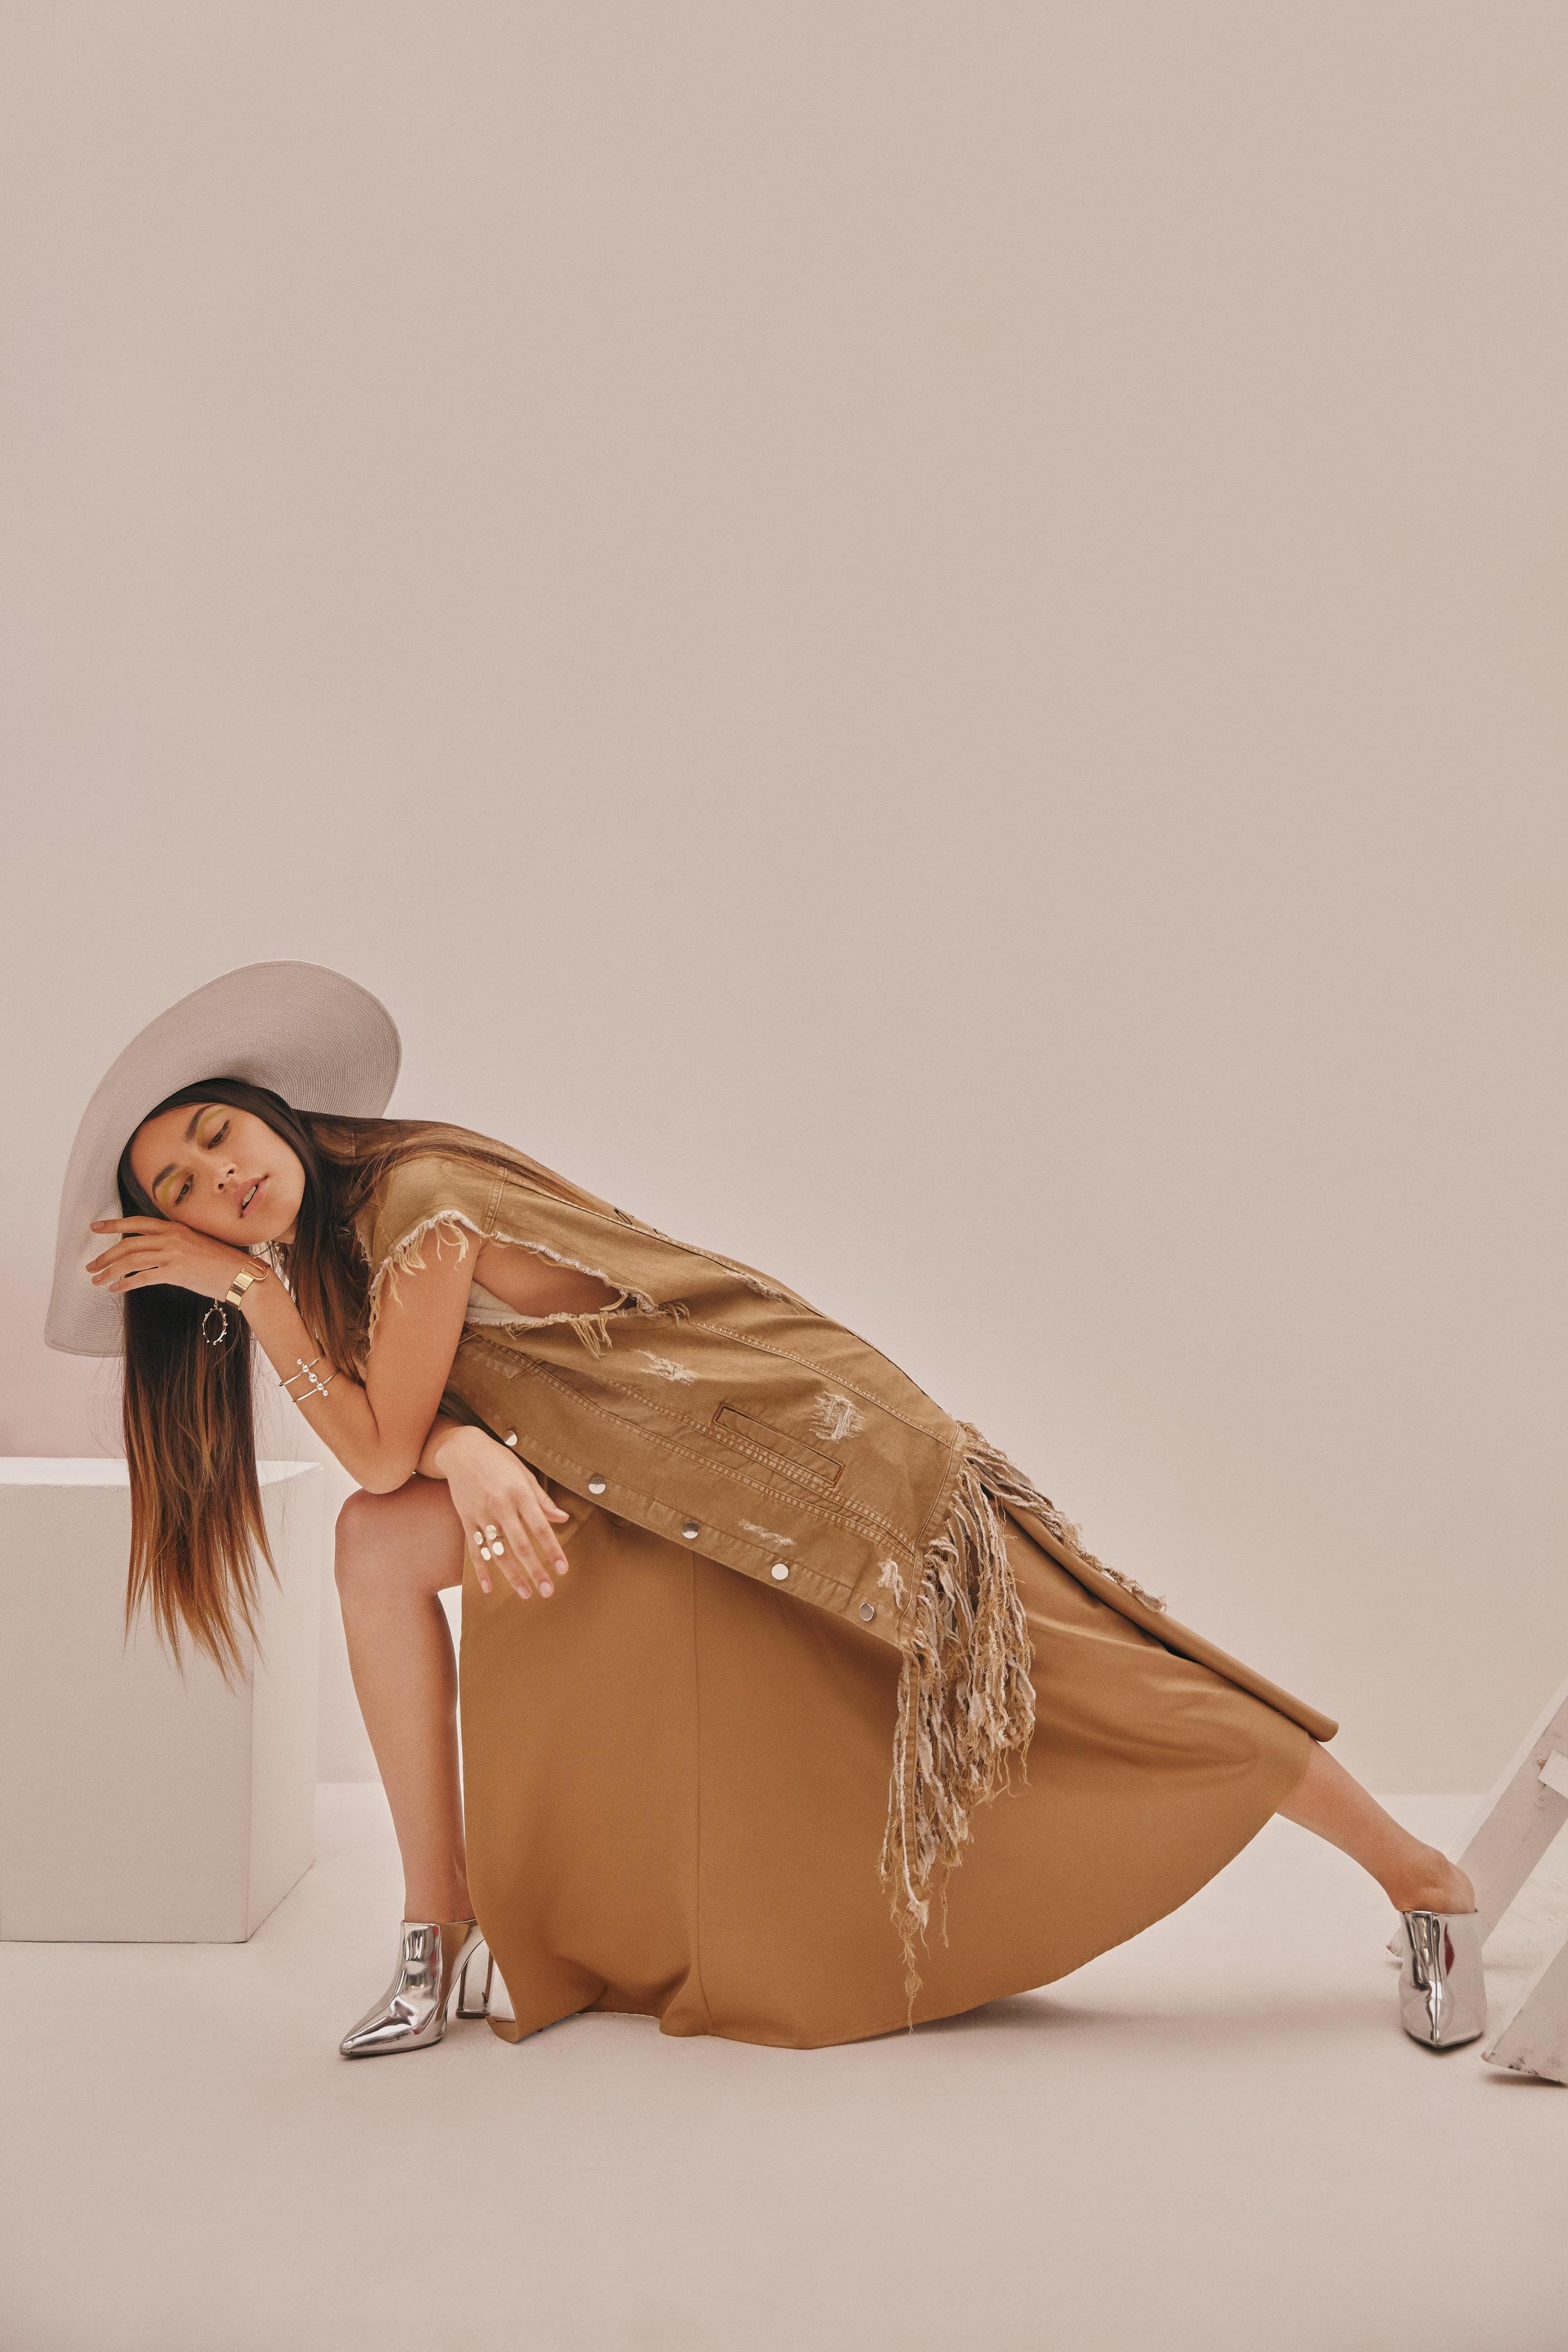 Denim vest:Alexandra Bueno- Skirt:Carlo Carrizosa- Hat: Lina Osorio - Jewelry: LaSierra Jewelry & Aysha Bilgrami- Boots: Stylist's own.